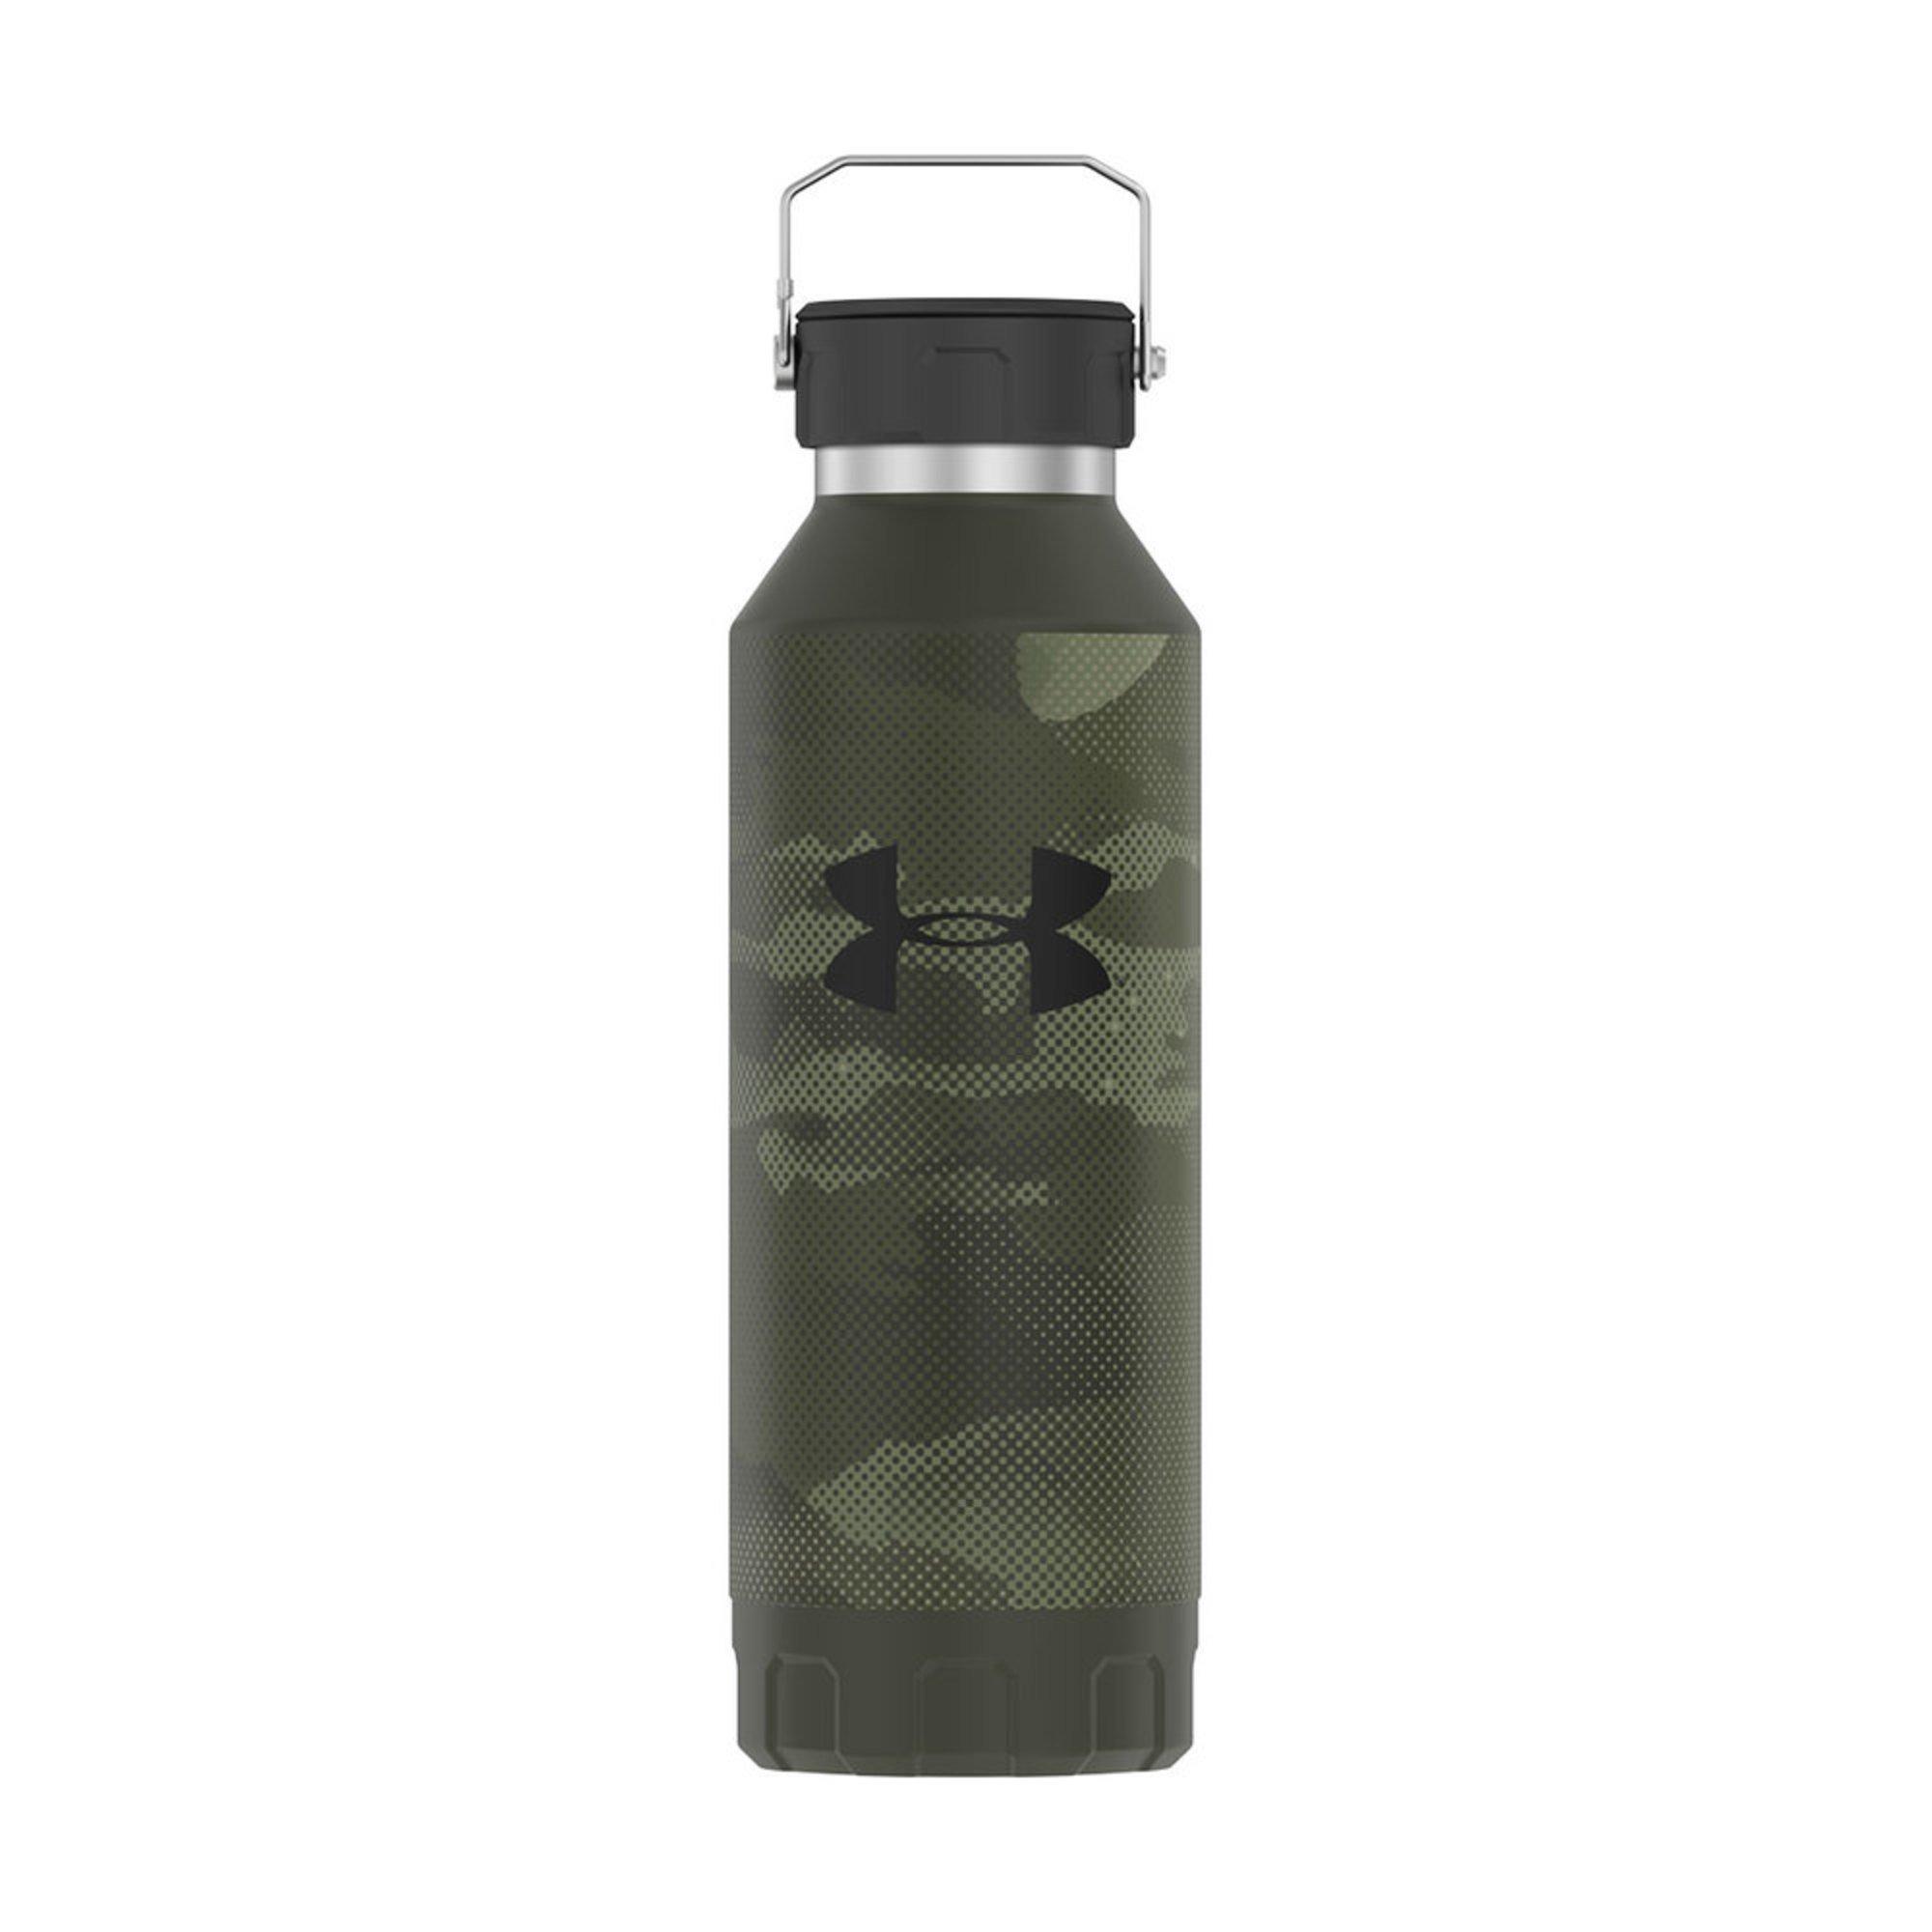 da63ce78e3 Under Armour. Under Armour Peak 24 Oz Vacuum Insulated Water Bottle